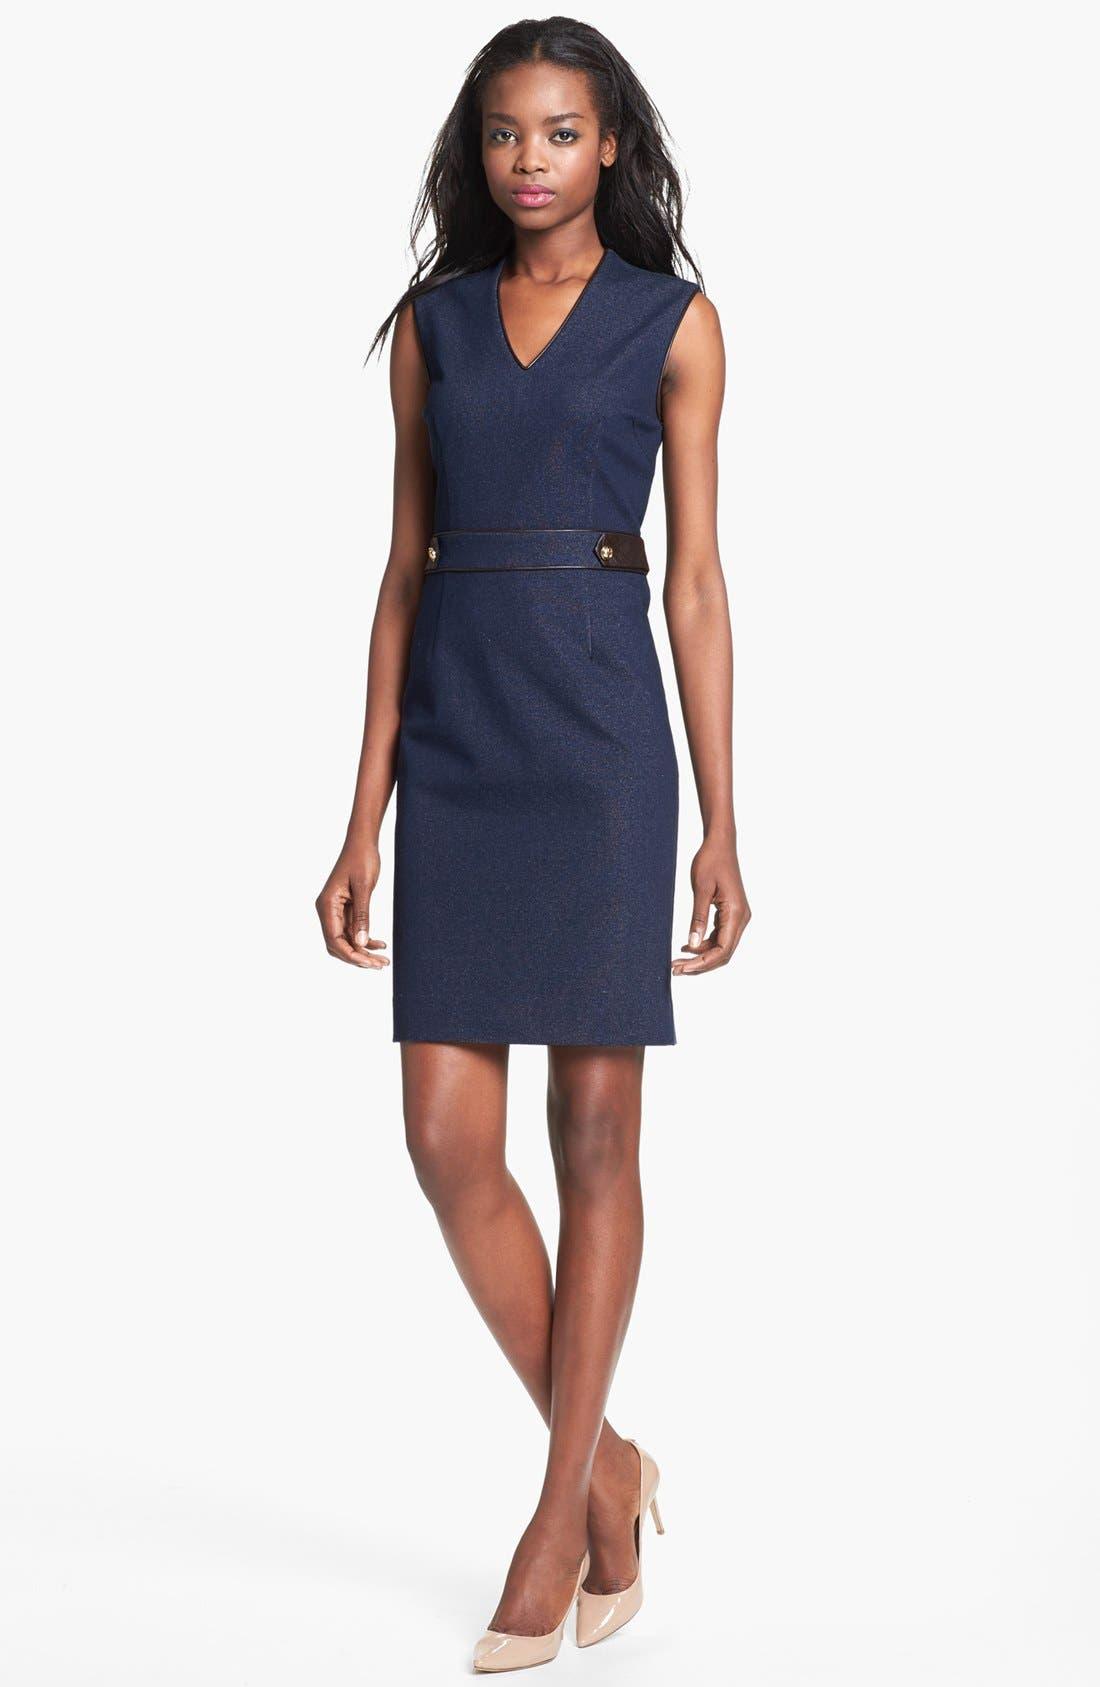 Alternate Image 1 Selected - Tory Burch Stretch Cotton Sheath Dress